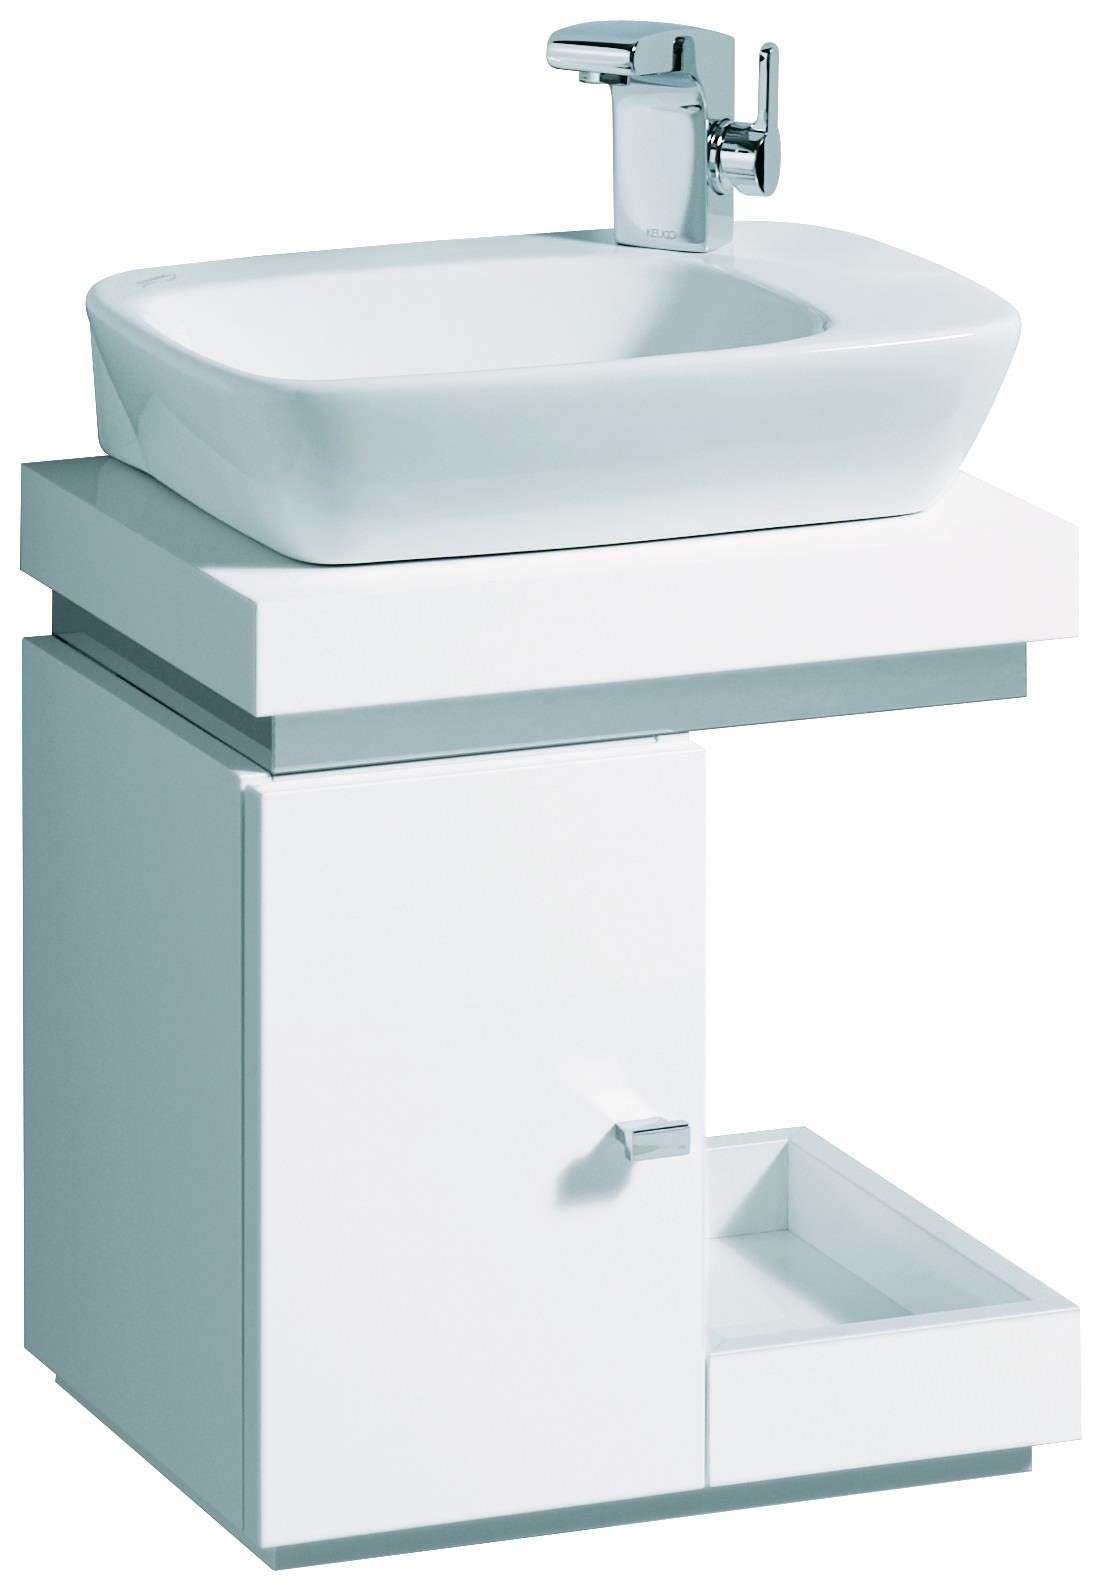 keramag silk handwaschbecken 400mm x 295mm wei alpin 121640000. Black Bedroom Furniture Sets. Home Design Ideas